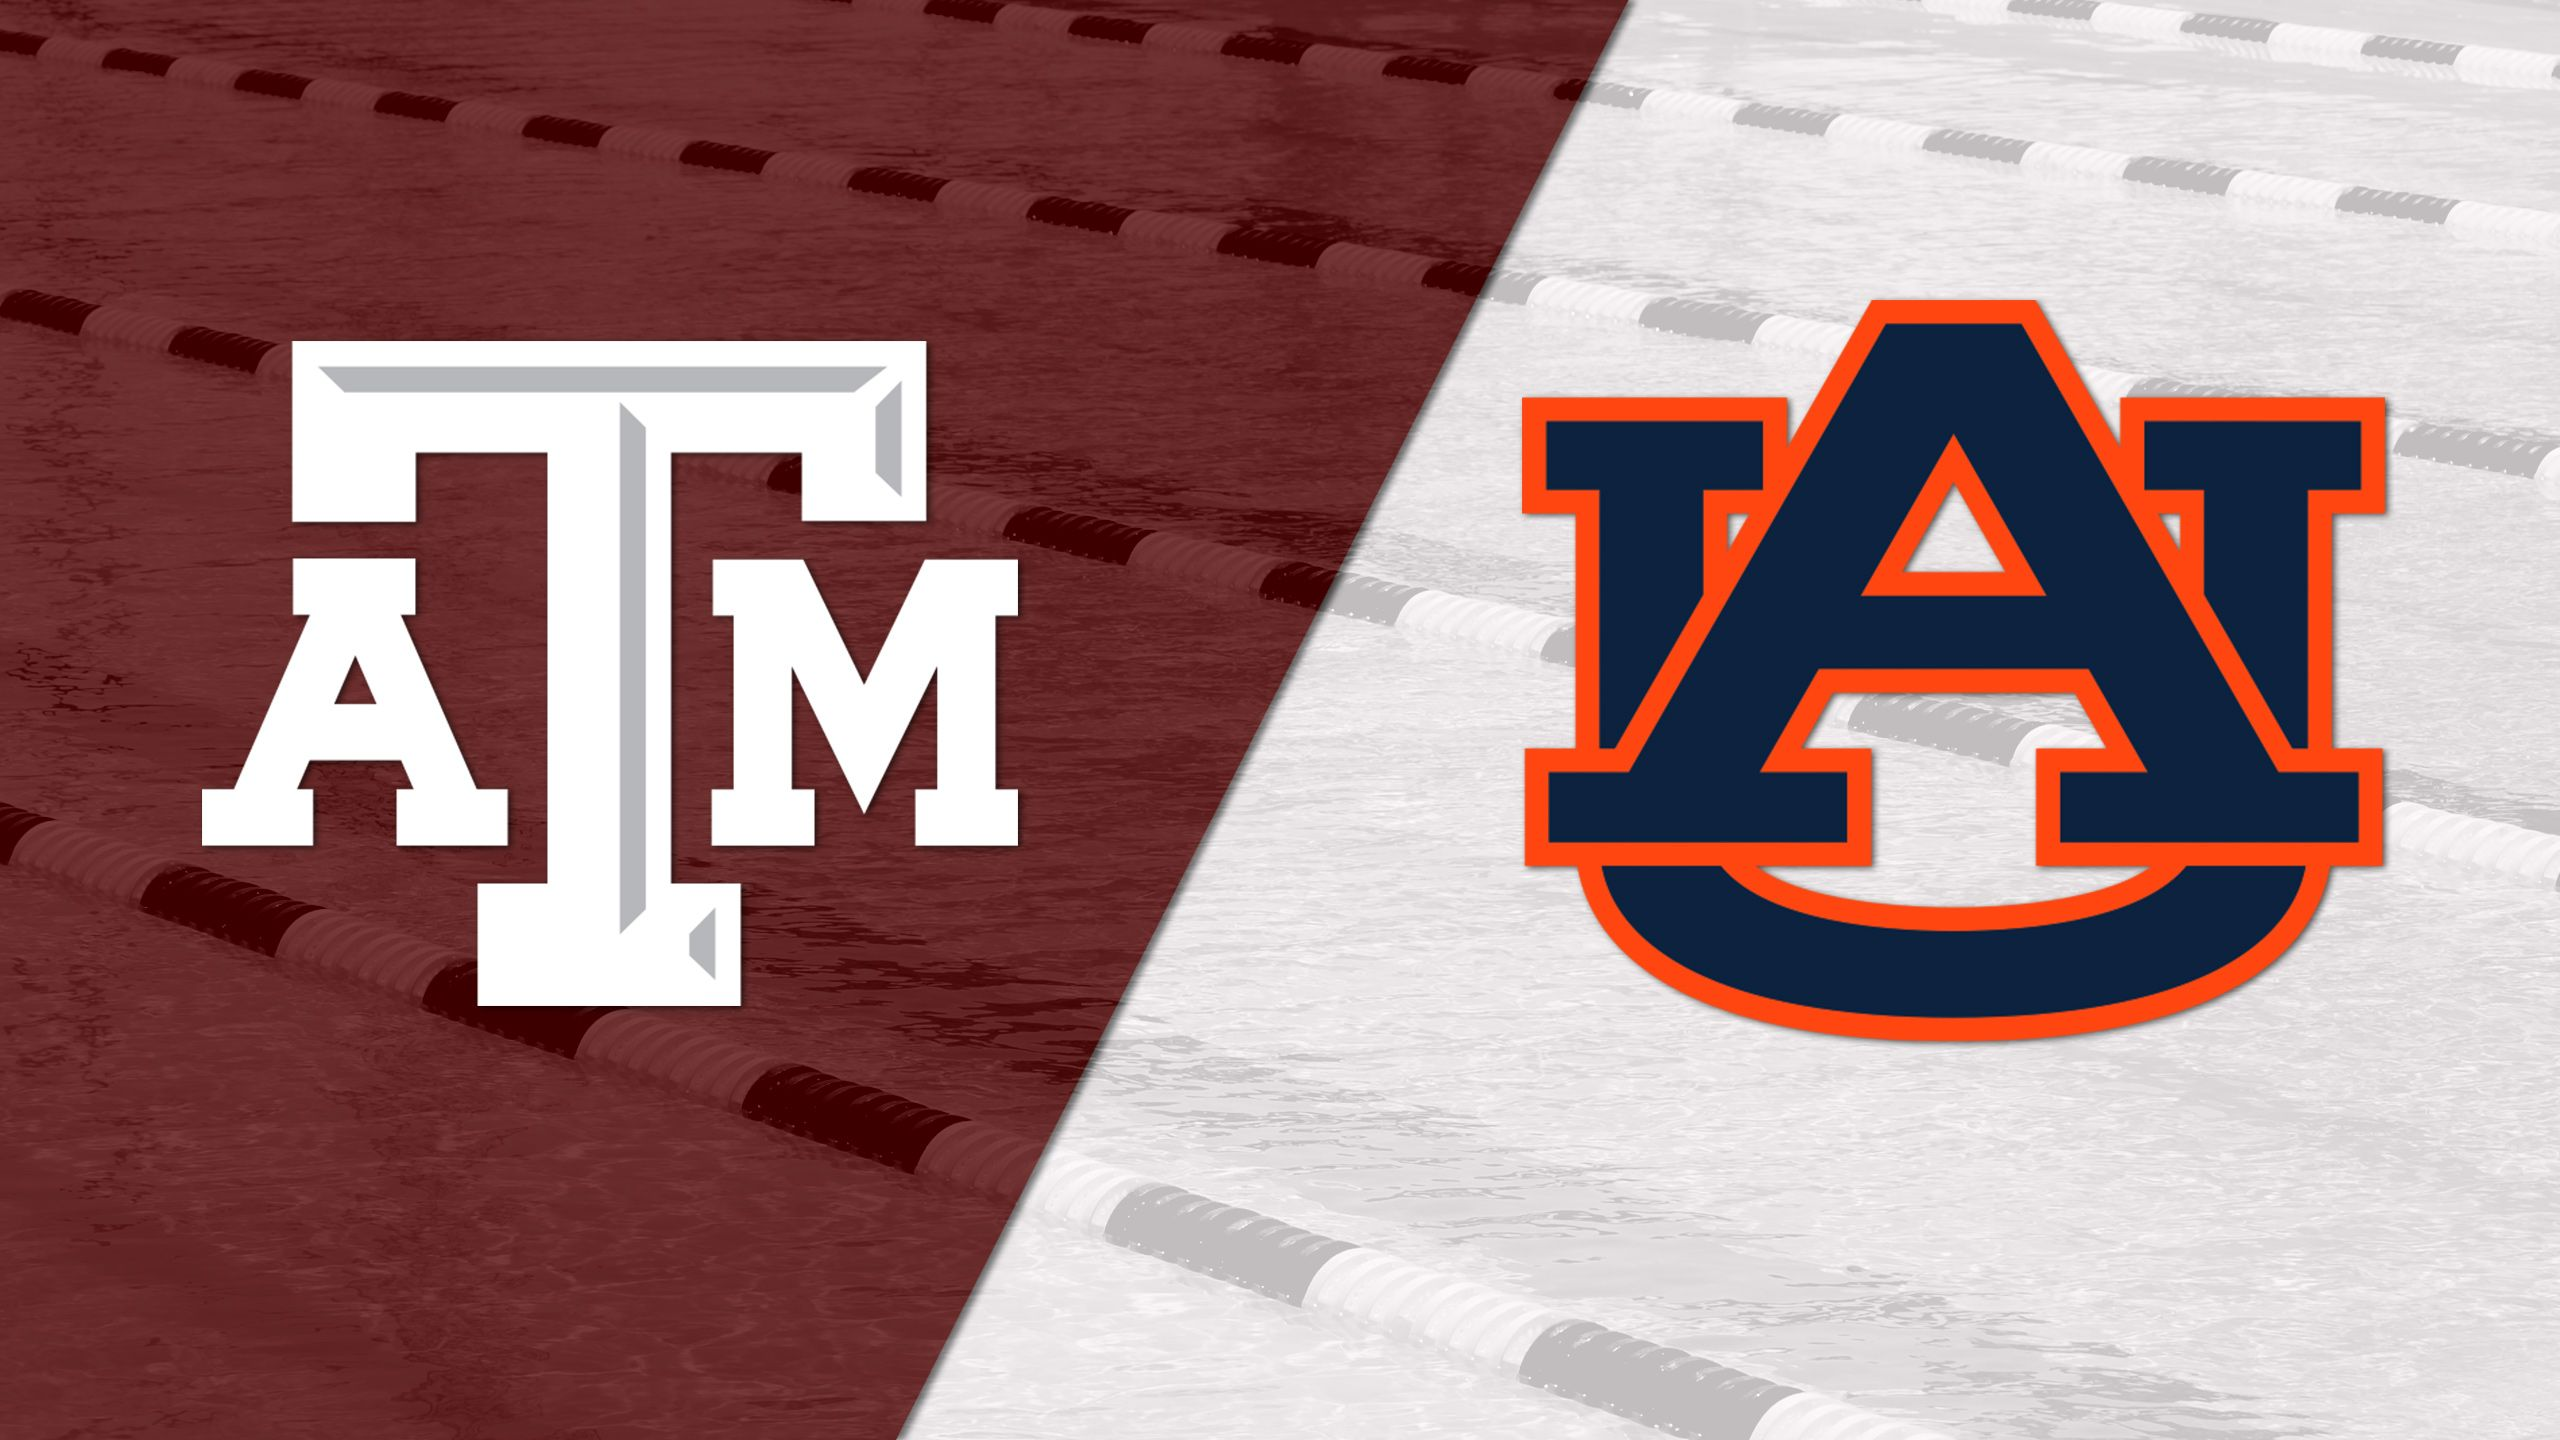 Texas A&M vs. Auburn (Swimming & Diving)